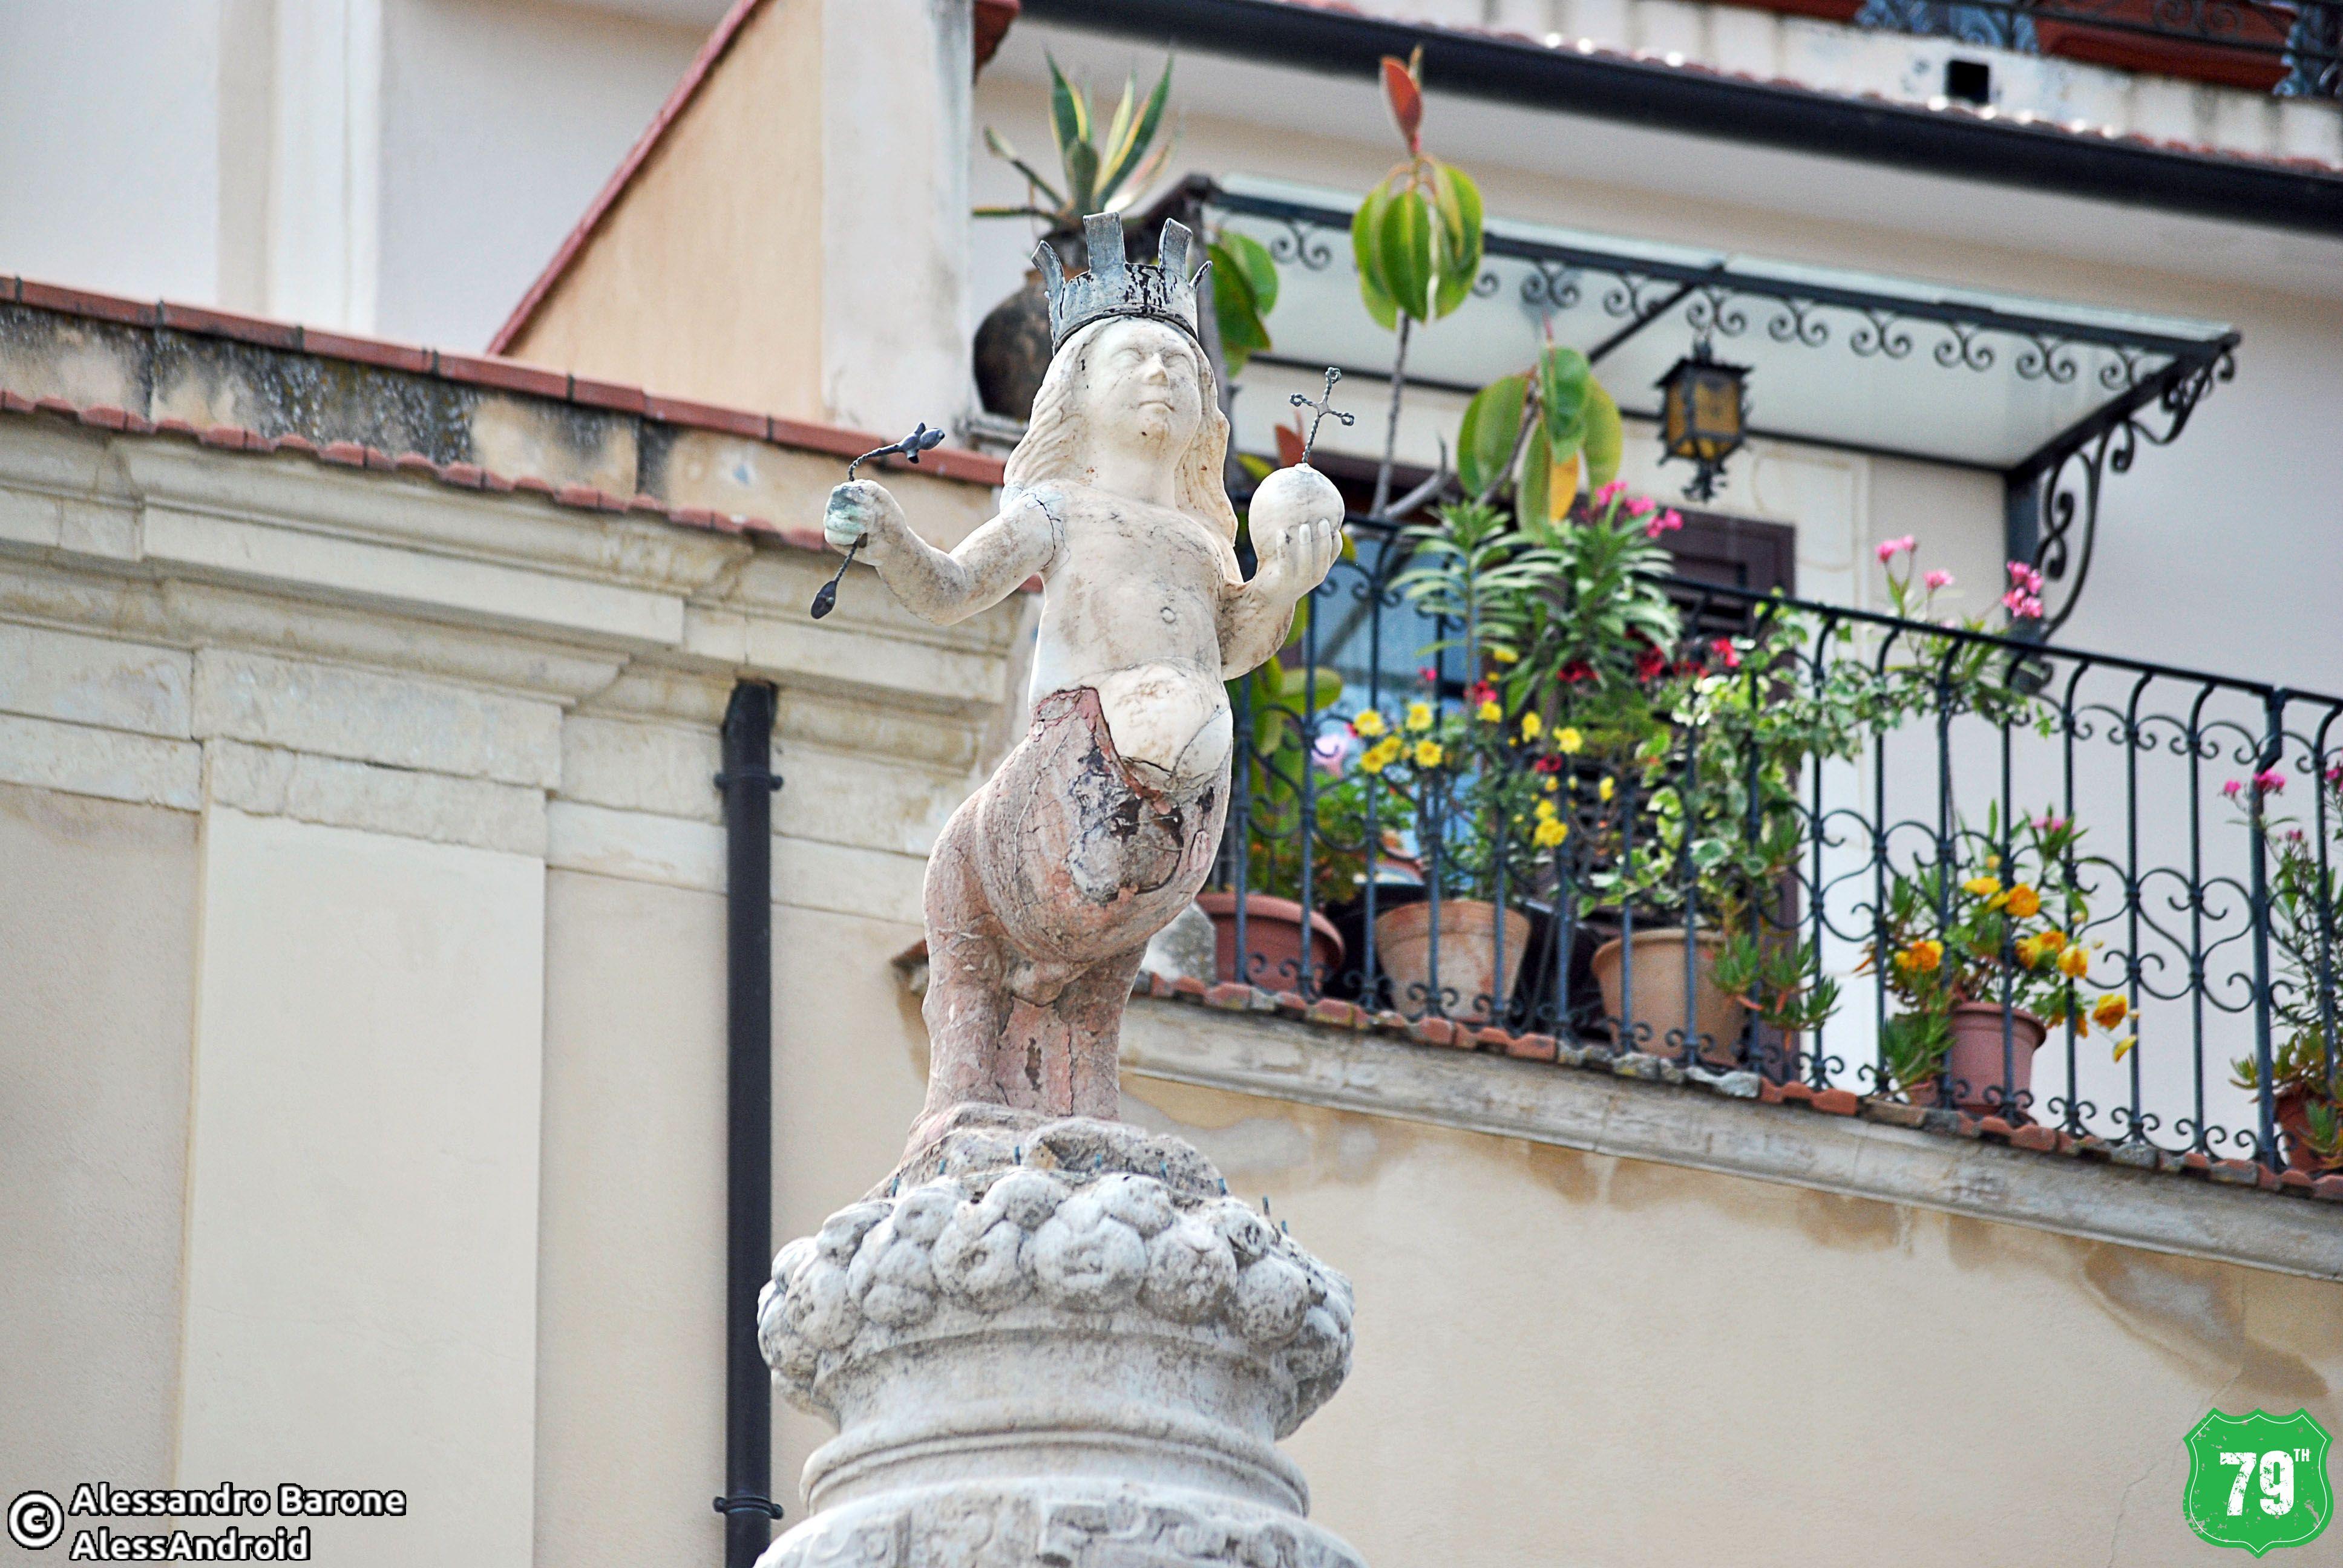 Fontana #Taormina #Messina #Sicilia #Sicily #Italia #Italy #Viaggiare #Viaggio #Travel #AlwaysOnTheRoad